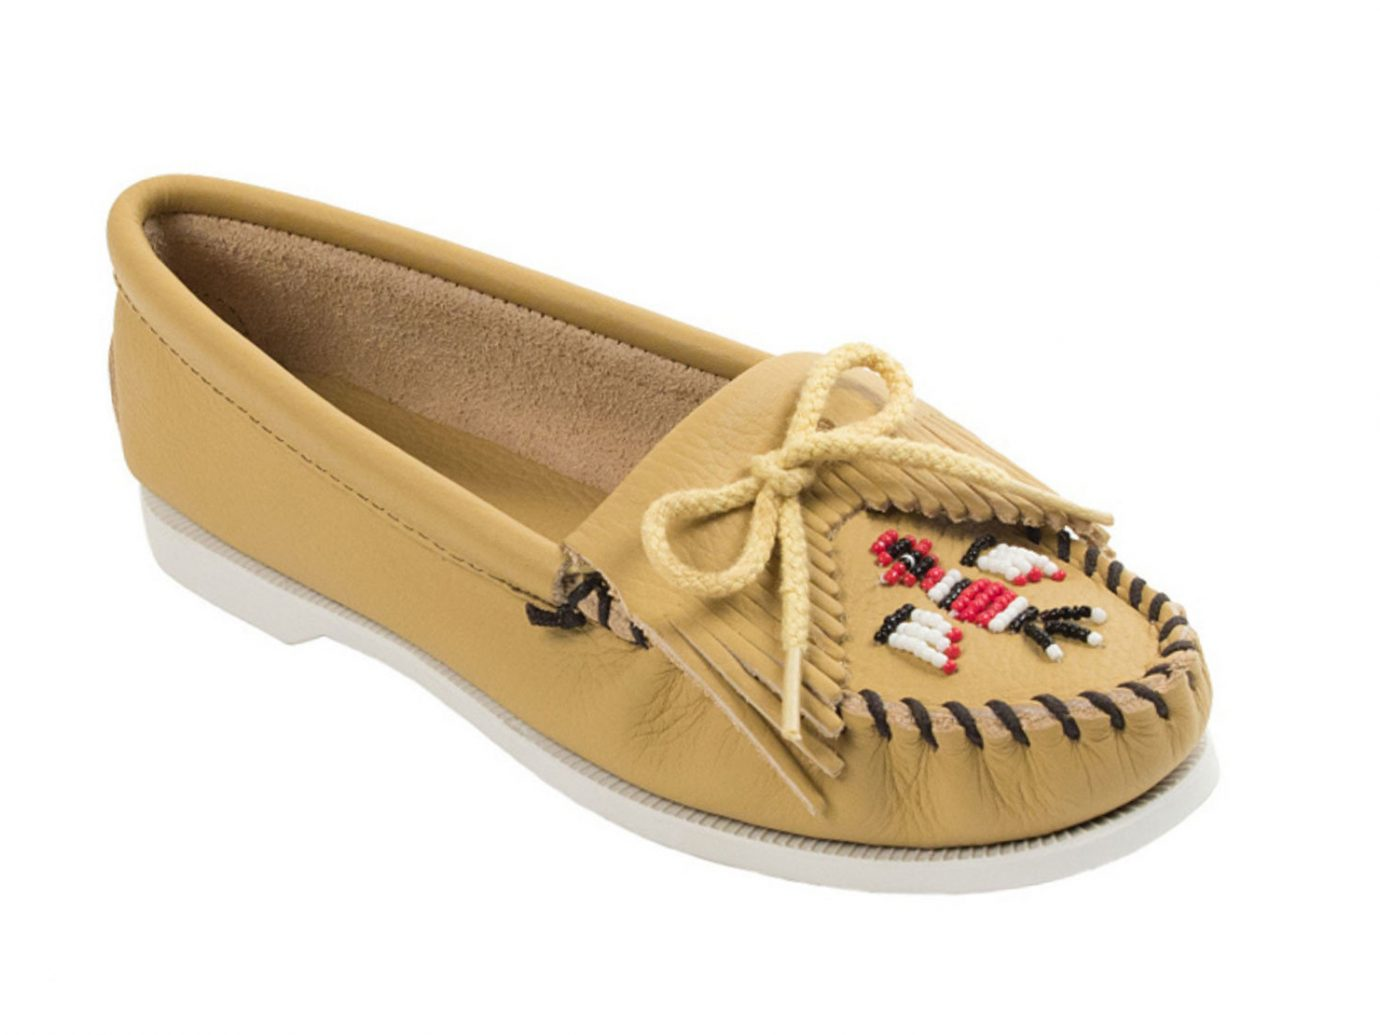 Style + Design Travel Shop Travel Tech Travel Tips footwear shoe brown khaki beige product walking shoe outdoor shoe product design shoes tan